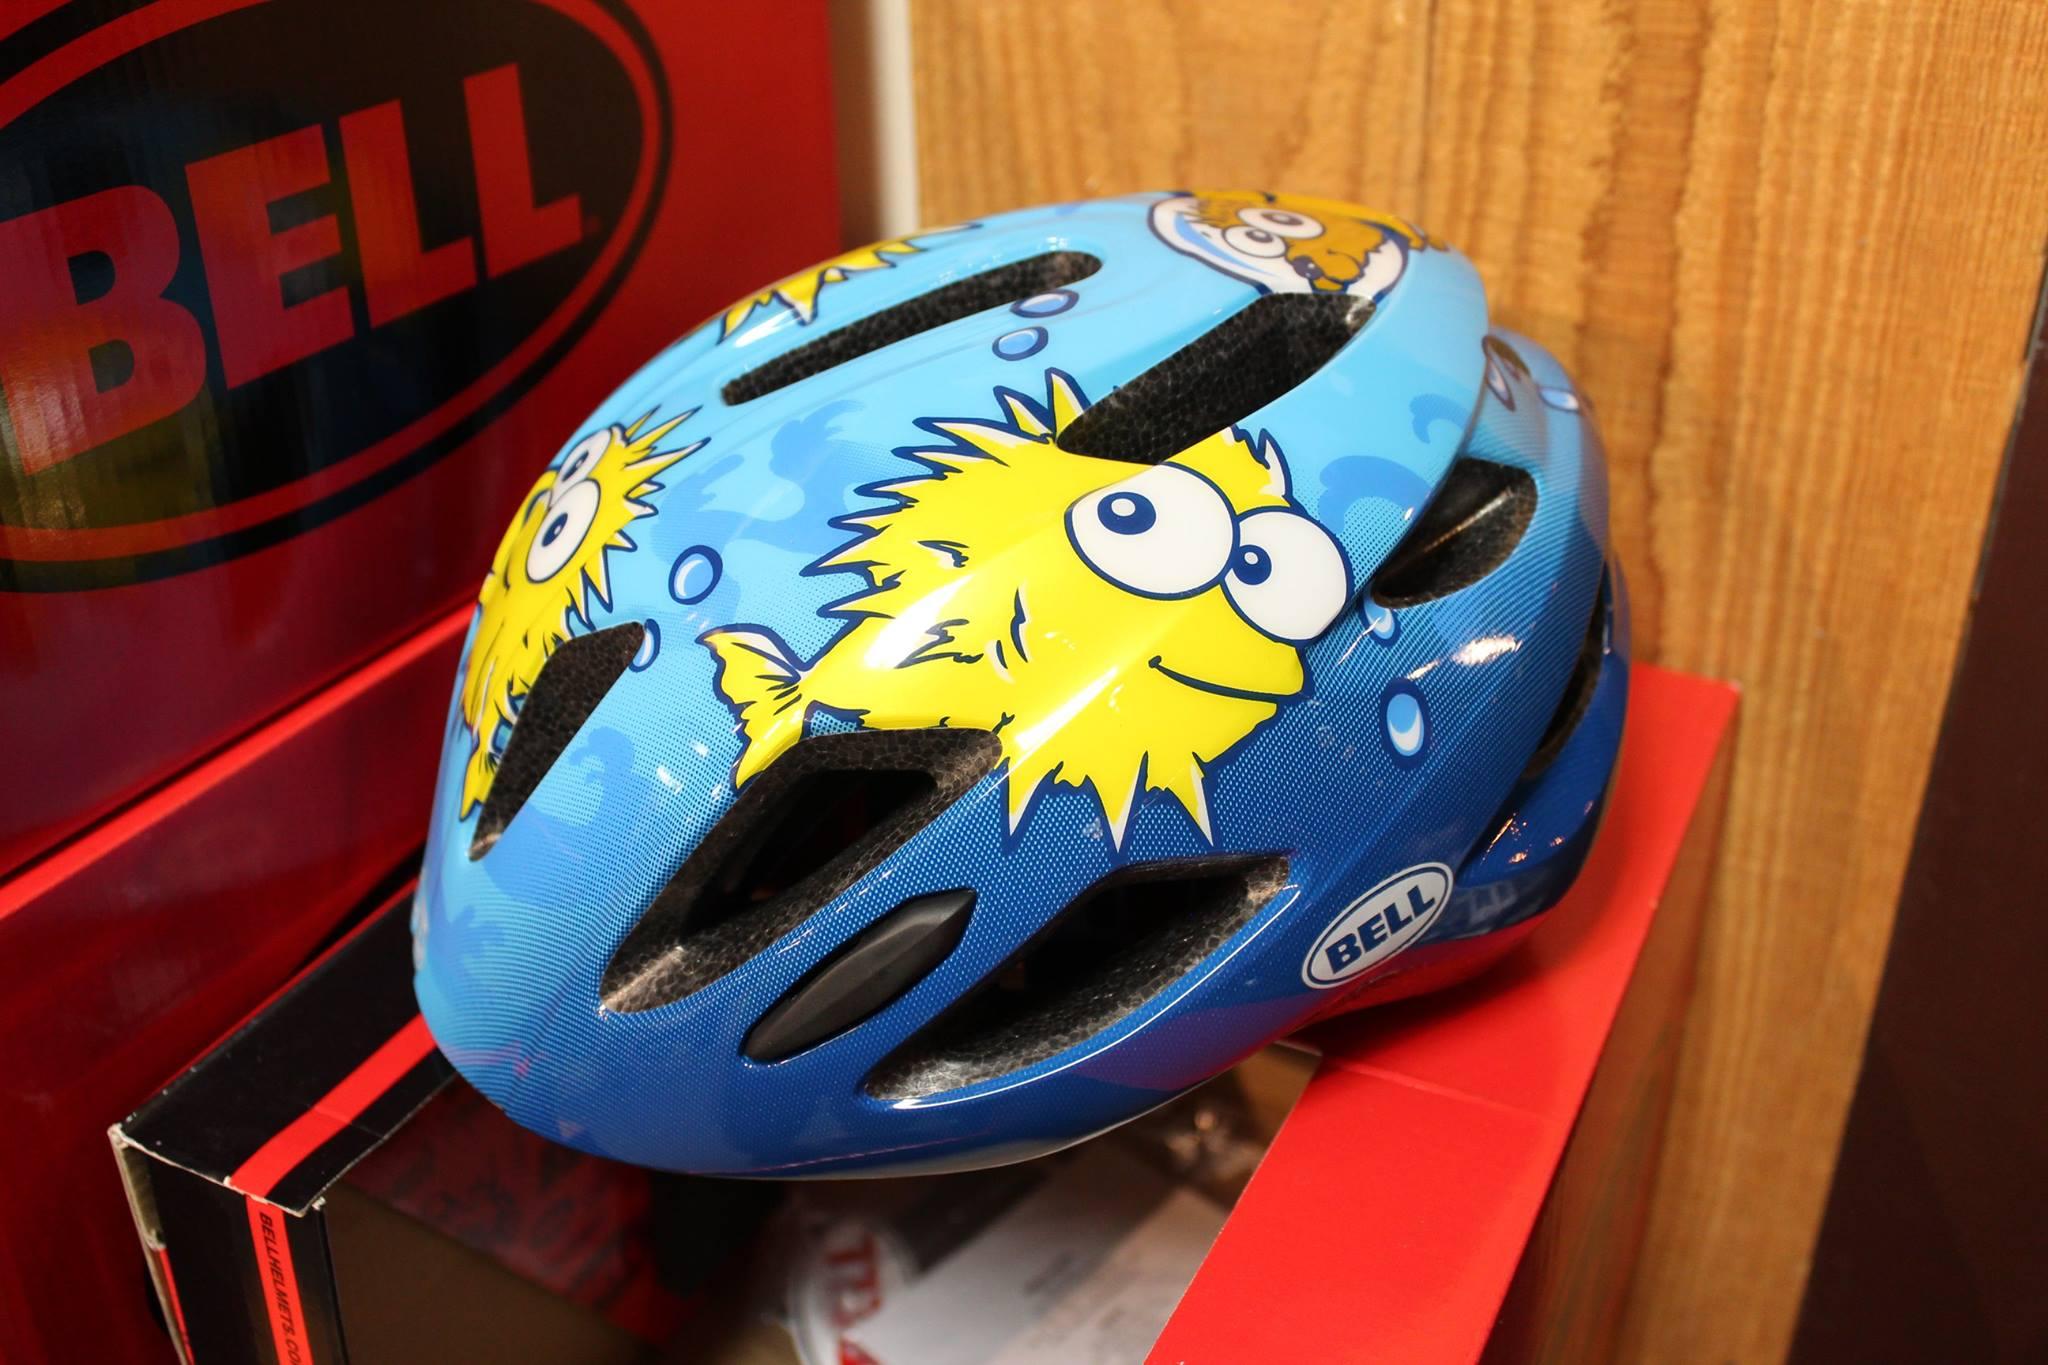 Bell Kid's Helmet